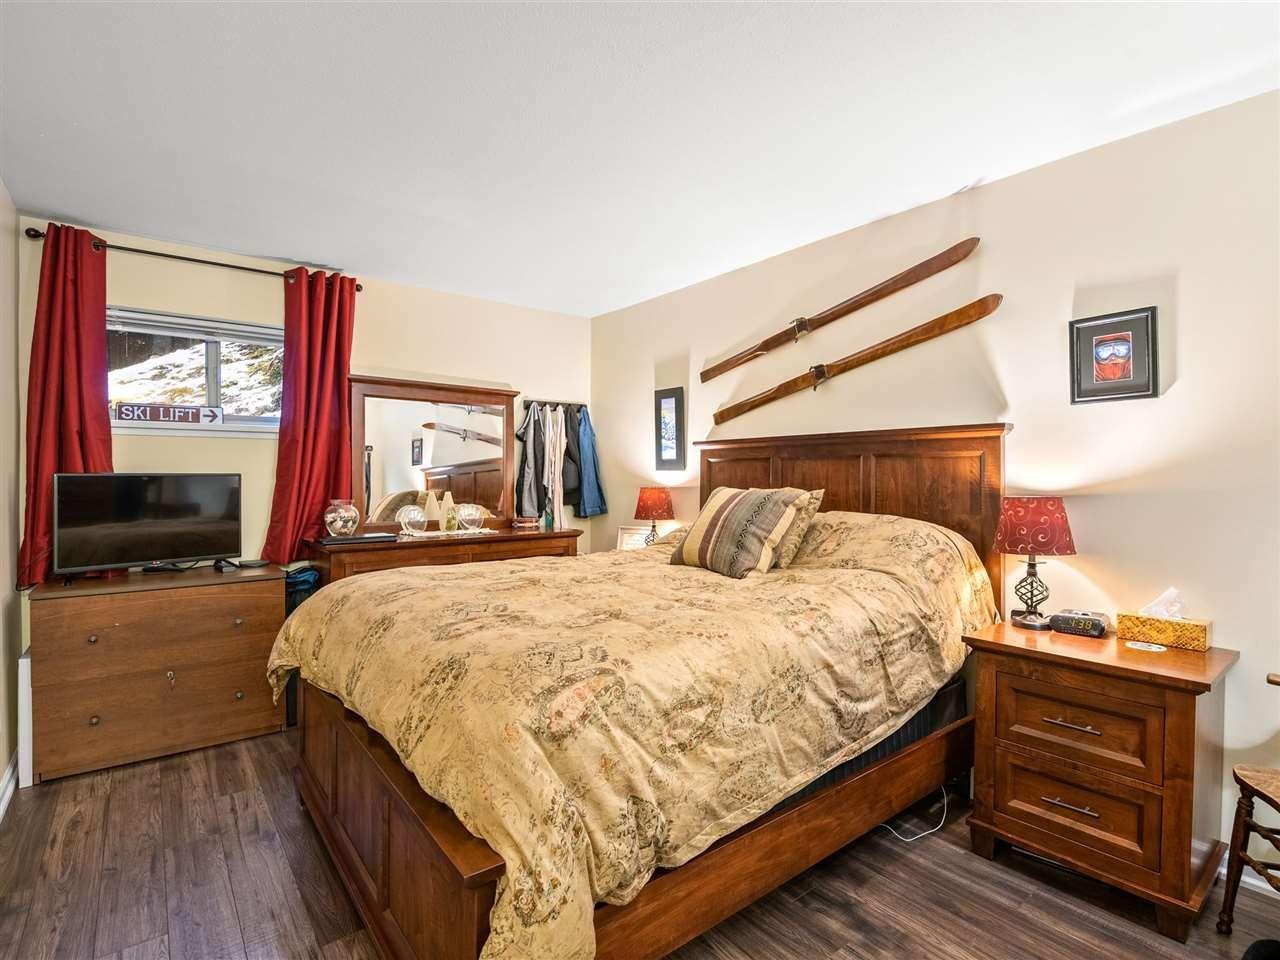 Photo 10: Photos: 101 3050 HILLCREST DRIVE in Whistler: Alta Vista Condo for sale : MLS®# R2513394